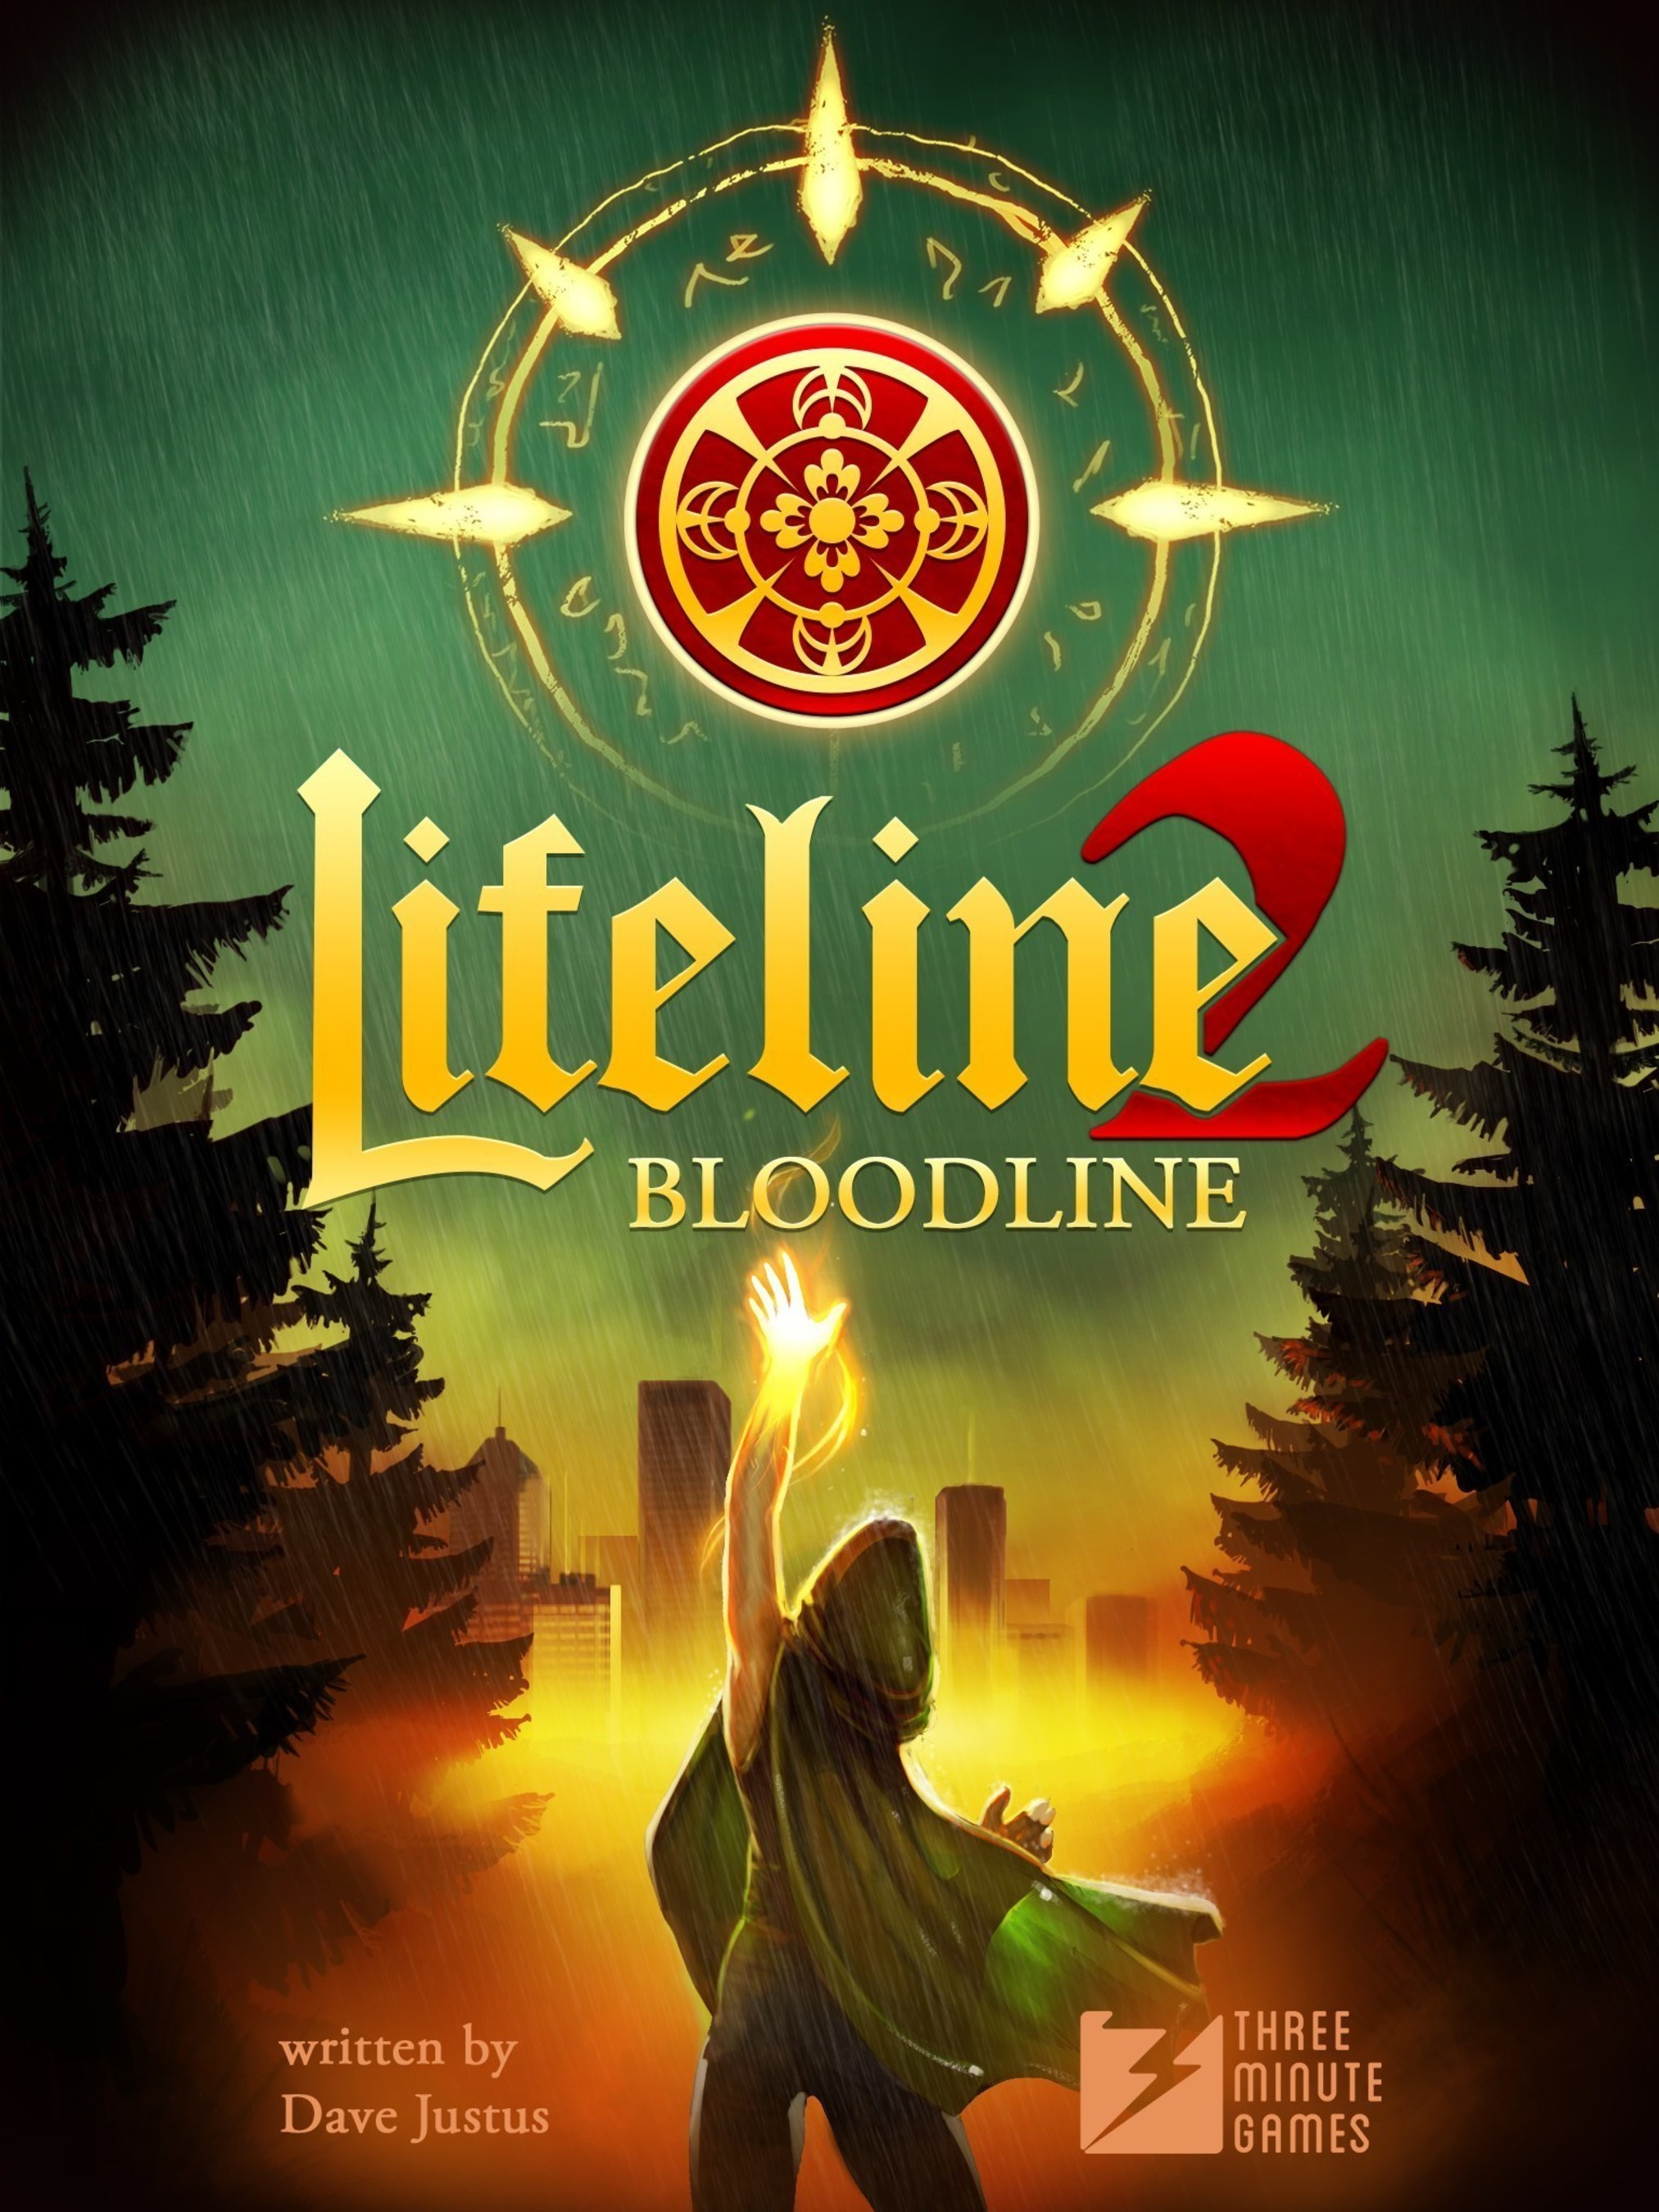 Lifeline 2 - Bloodline